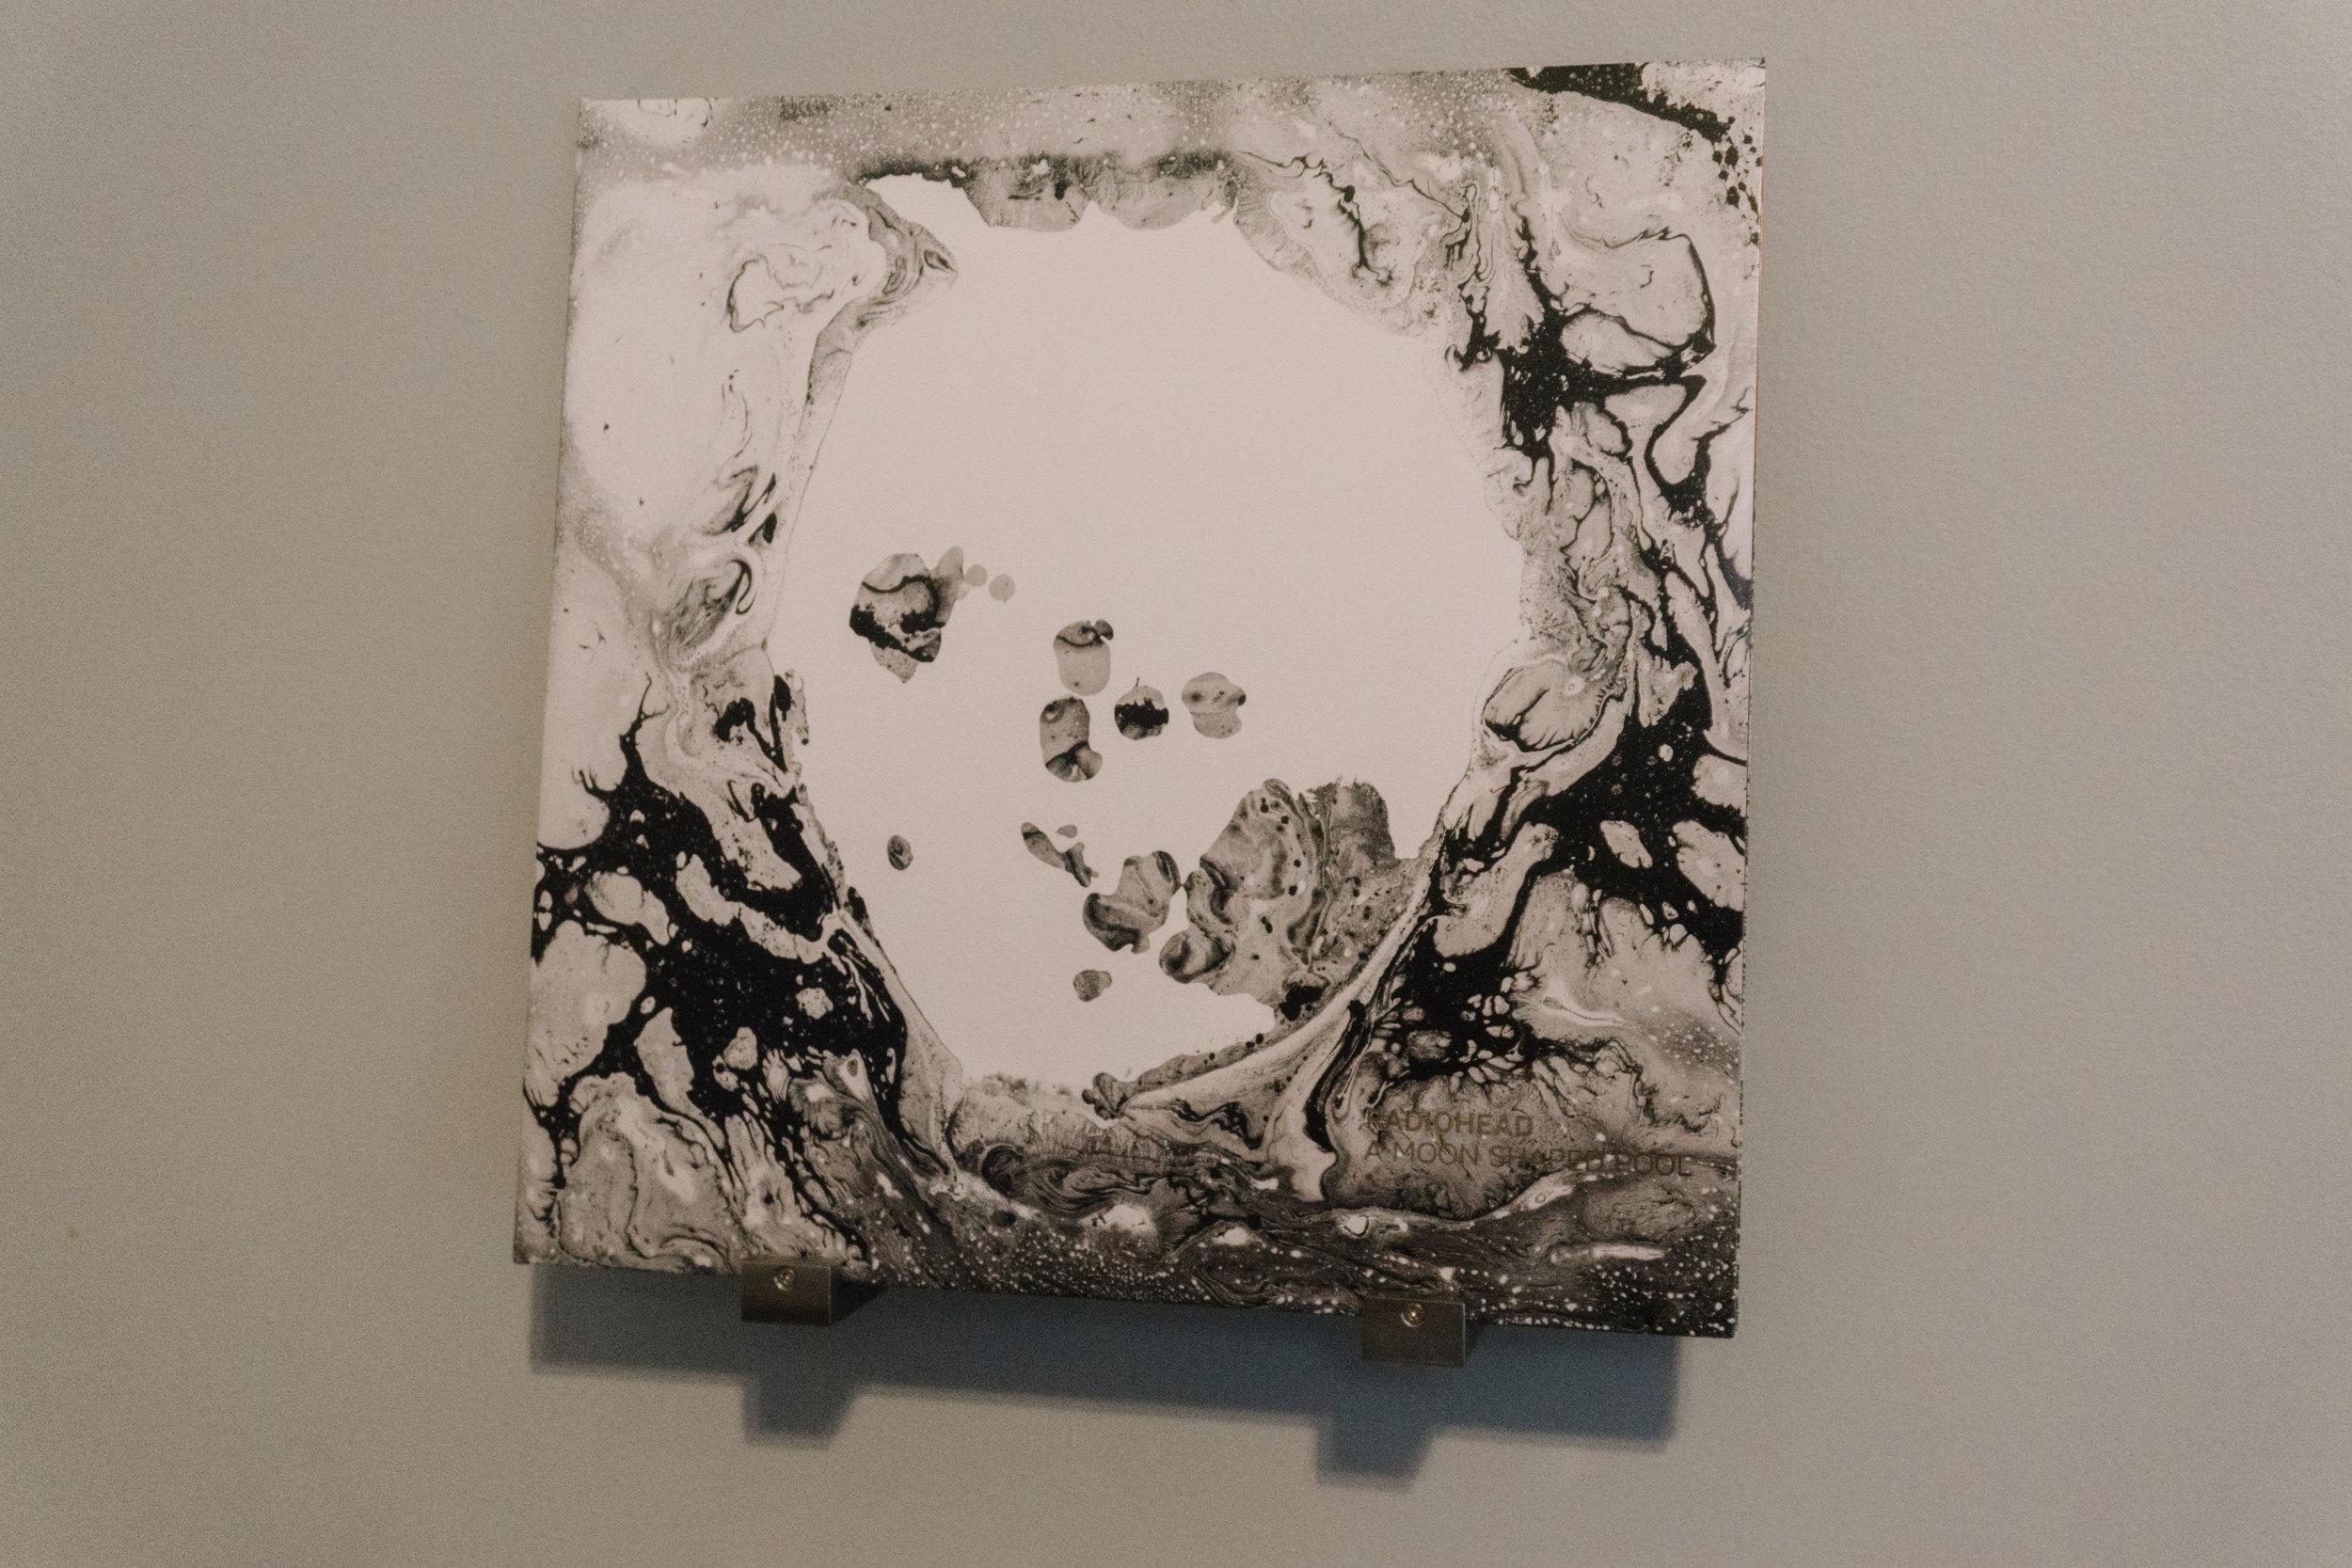 Radiohead A Moon Shaped Pool Record